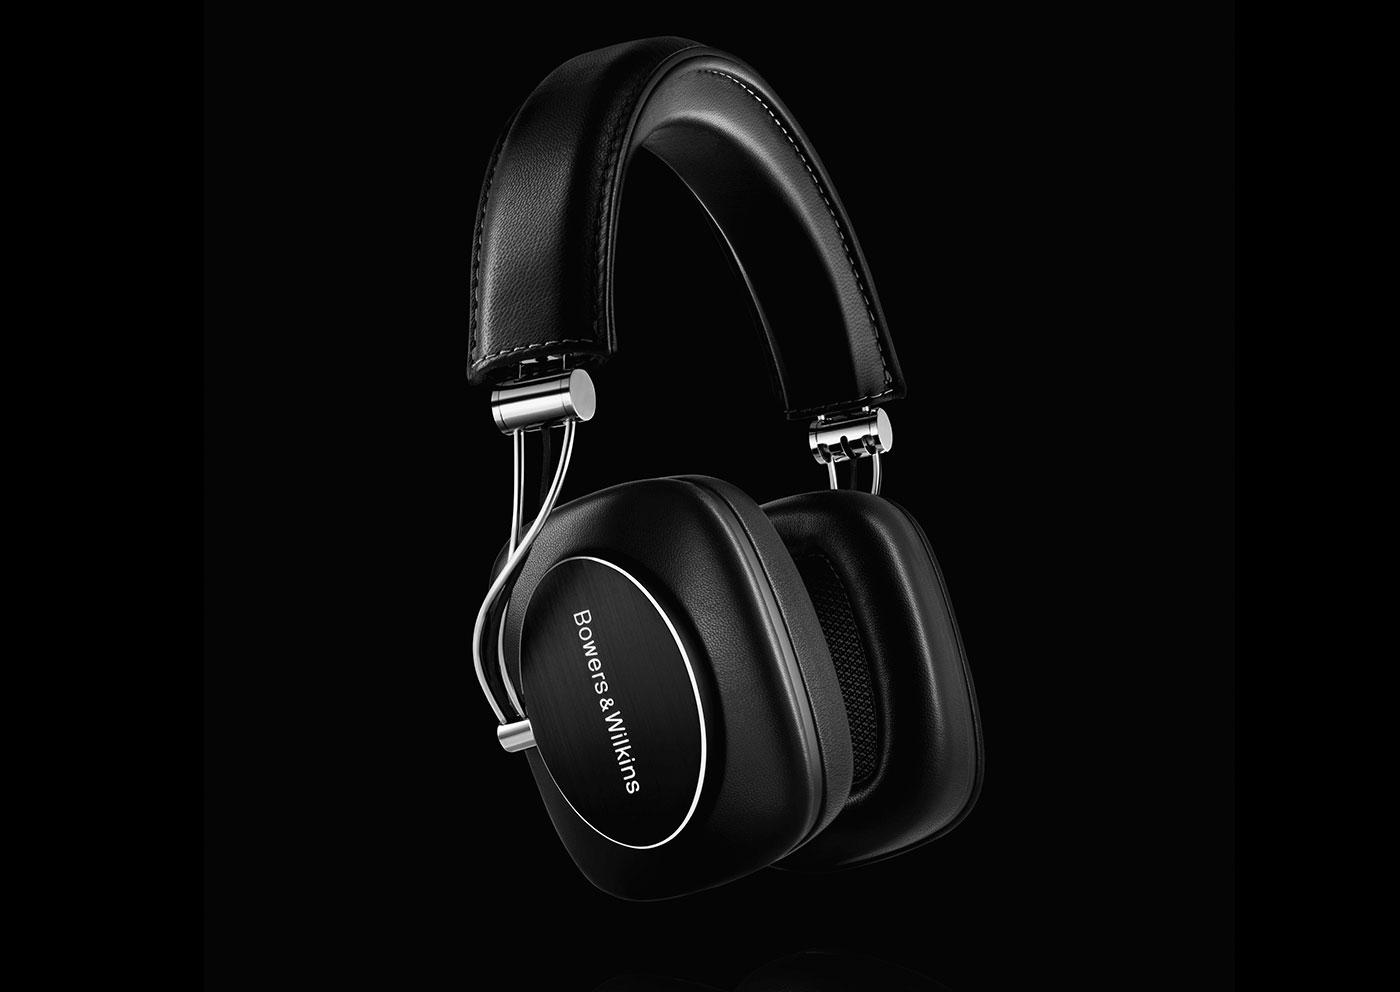 P7 Wireless (BLACK)